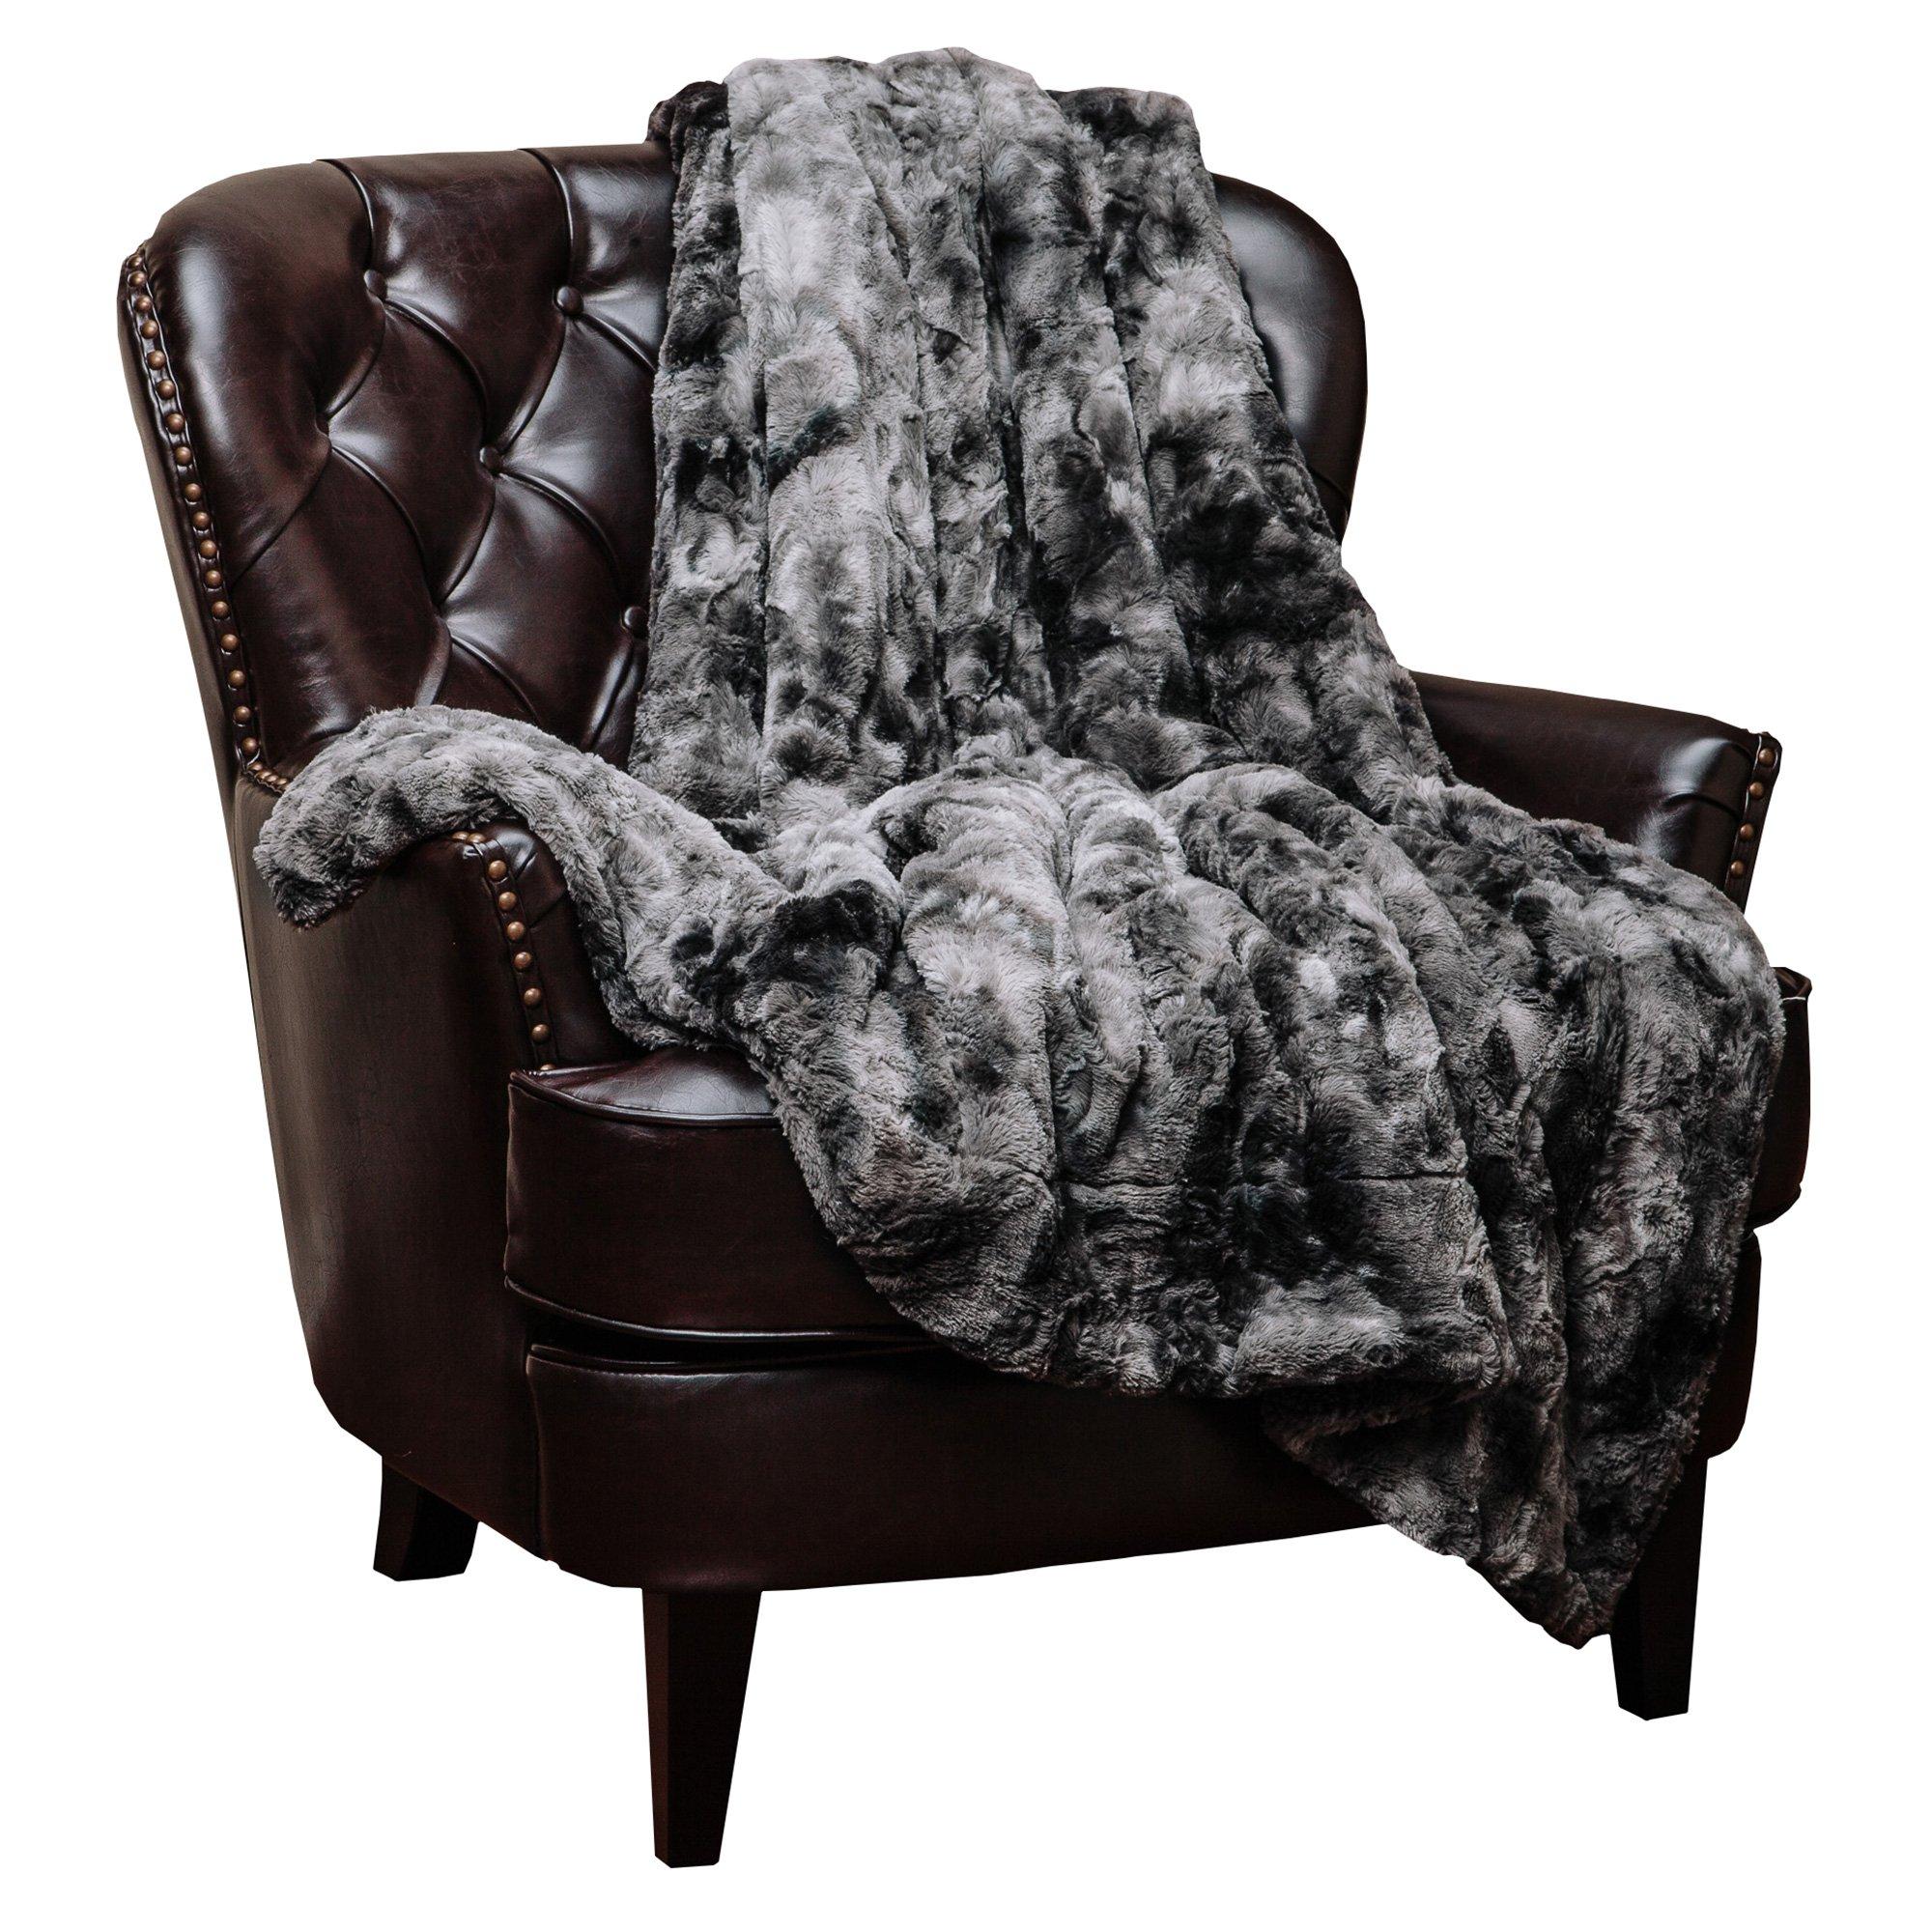 Chanasya Faux Fur Throw Blanket   Super Soft Fuzzy Light Weight Luxurious Cozy Warm Fluffy Plush Hypoallergenic Blanket for Bed Couch Chair Fall Winter Spring Living Room (60 x 70) - Dark Grey by Chanasya